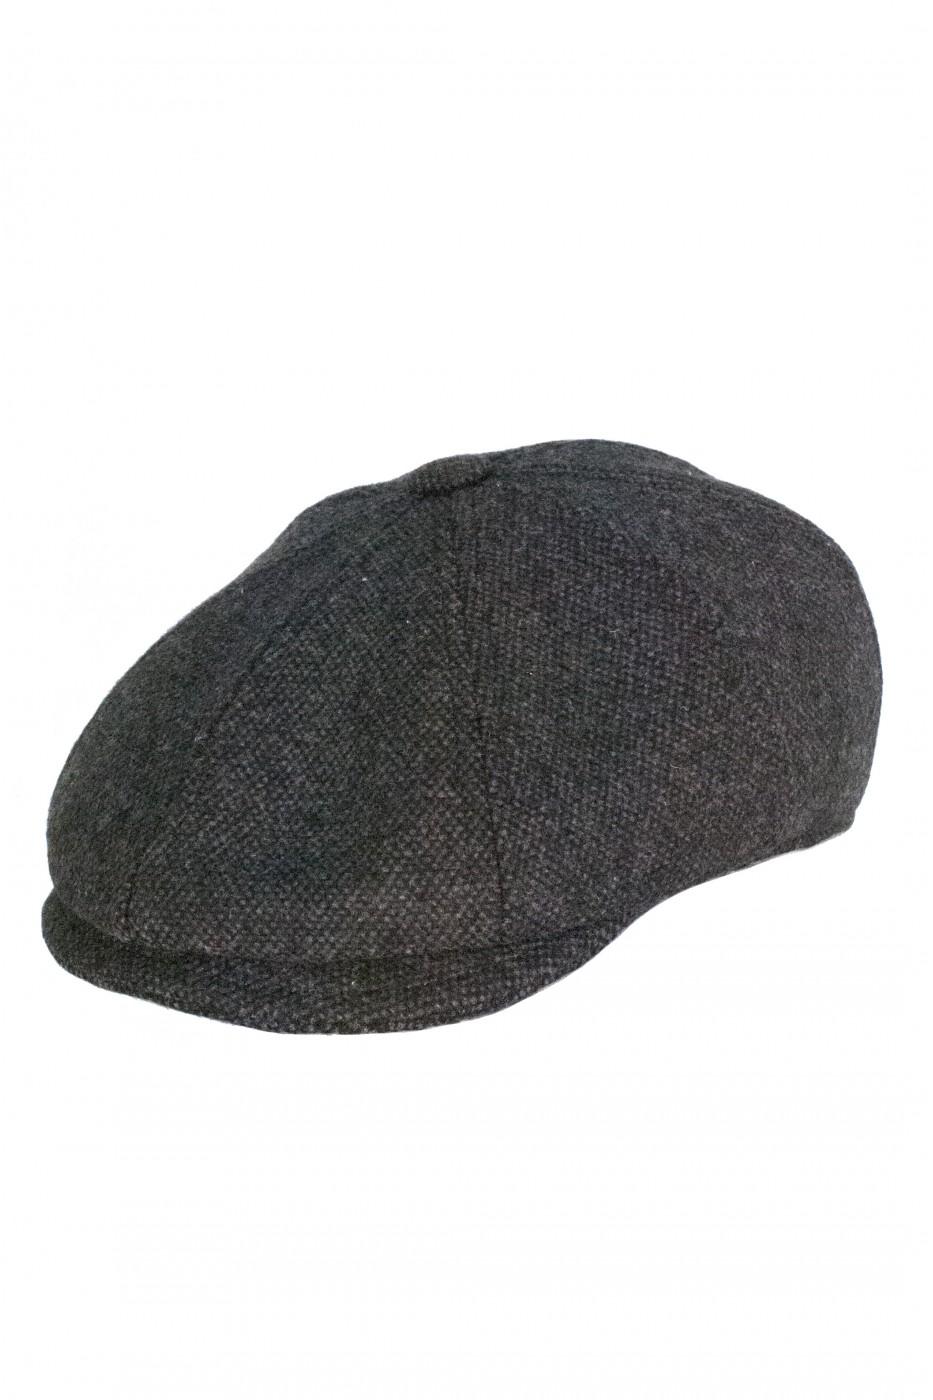 Тёмно-серая мужская кепи 006 (KIRK-TK18)